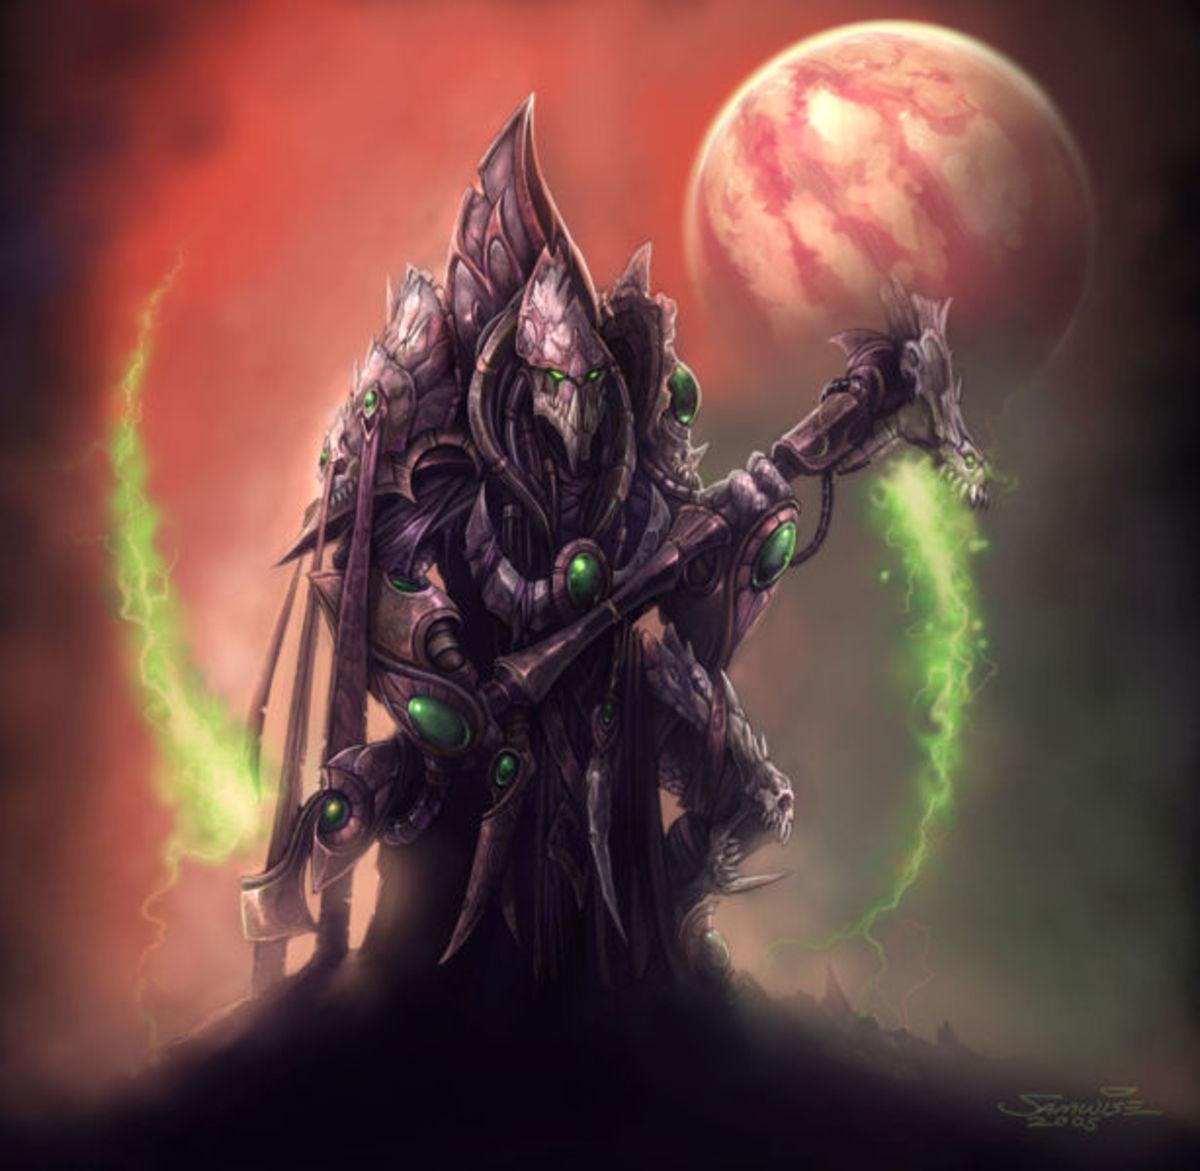 StarCraft 2 - A Protoss creature named Dark Templar